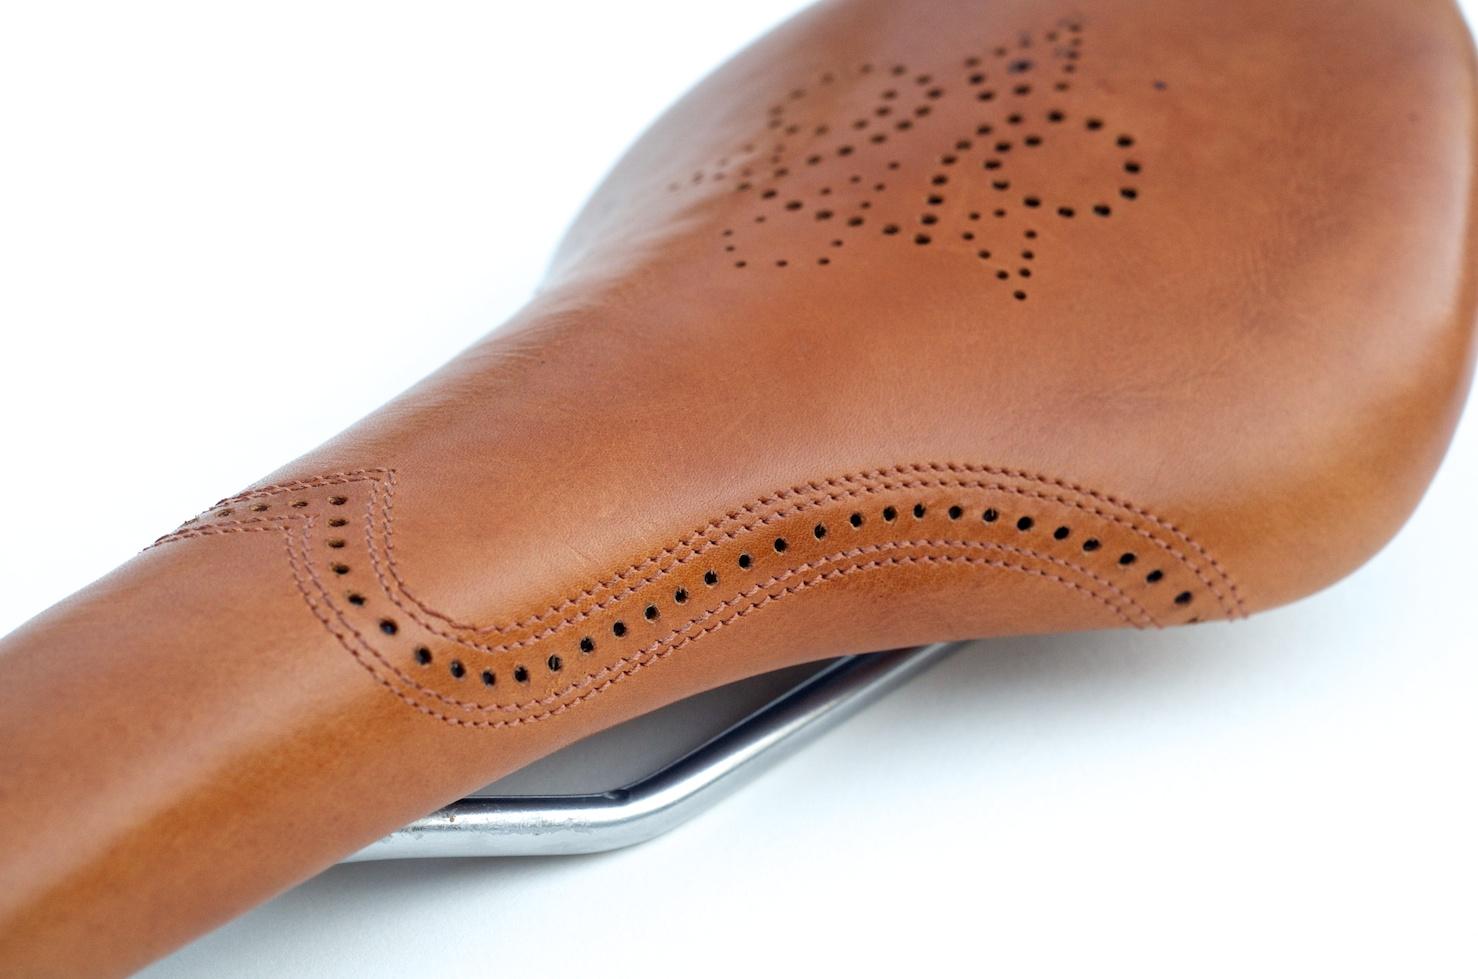 Leh-Seats-carson-leather-bike-seat-custom-oxford-brogue-shoe-saddle-bike-bicycle-brooks-hand-made 5.jpg